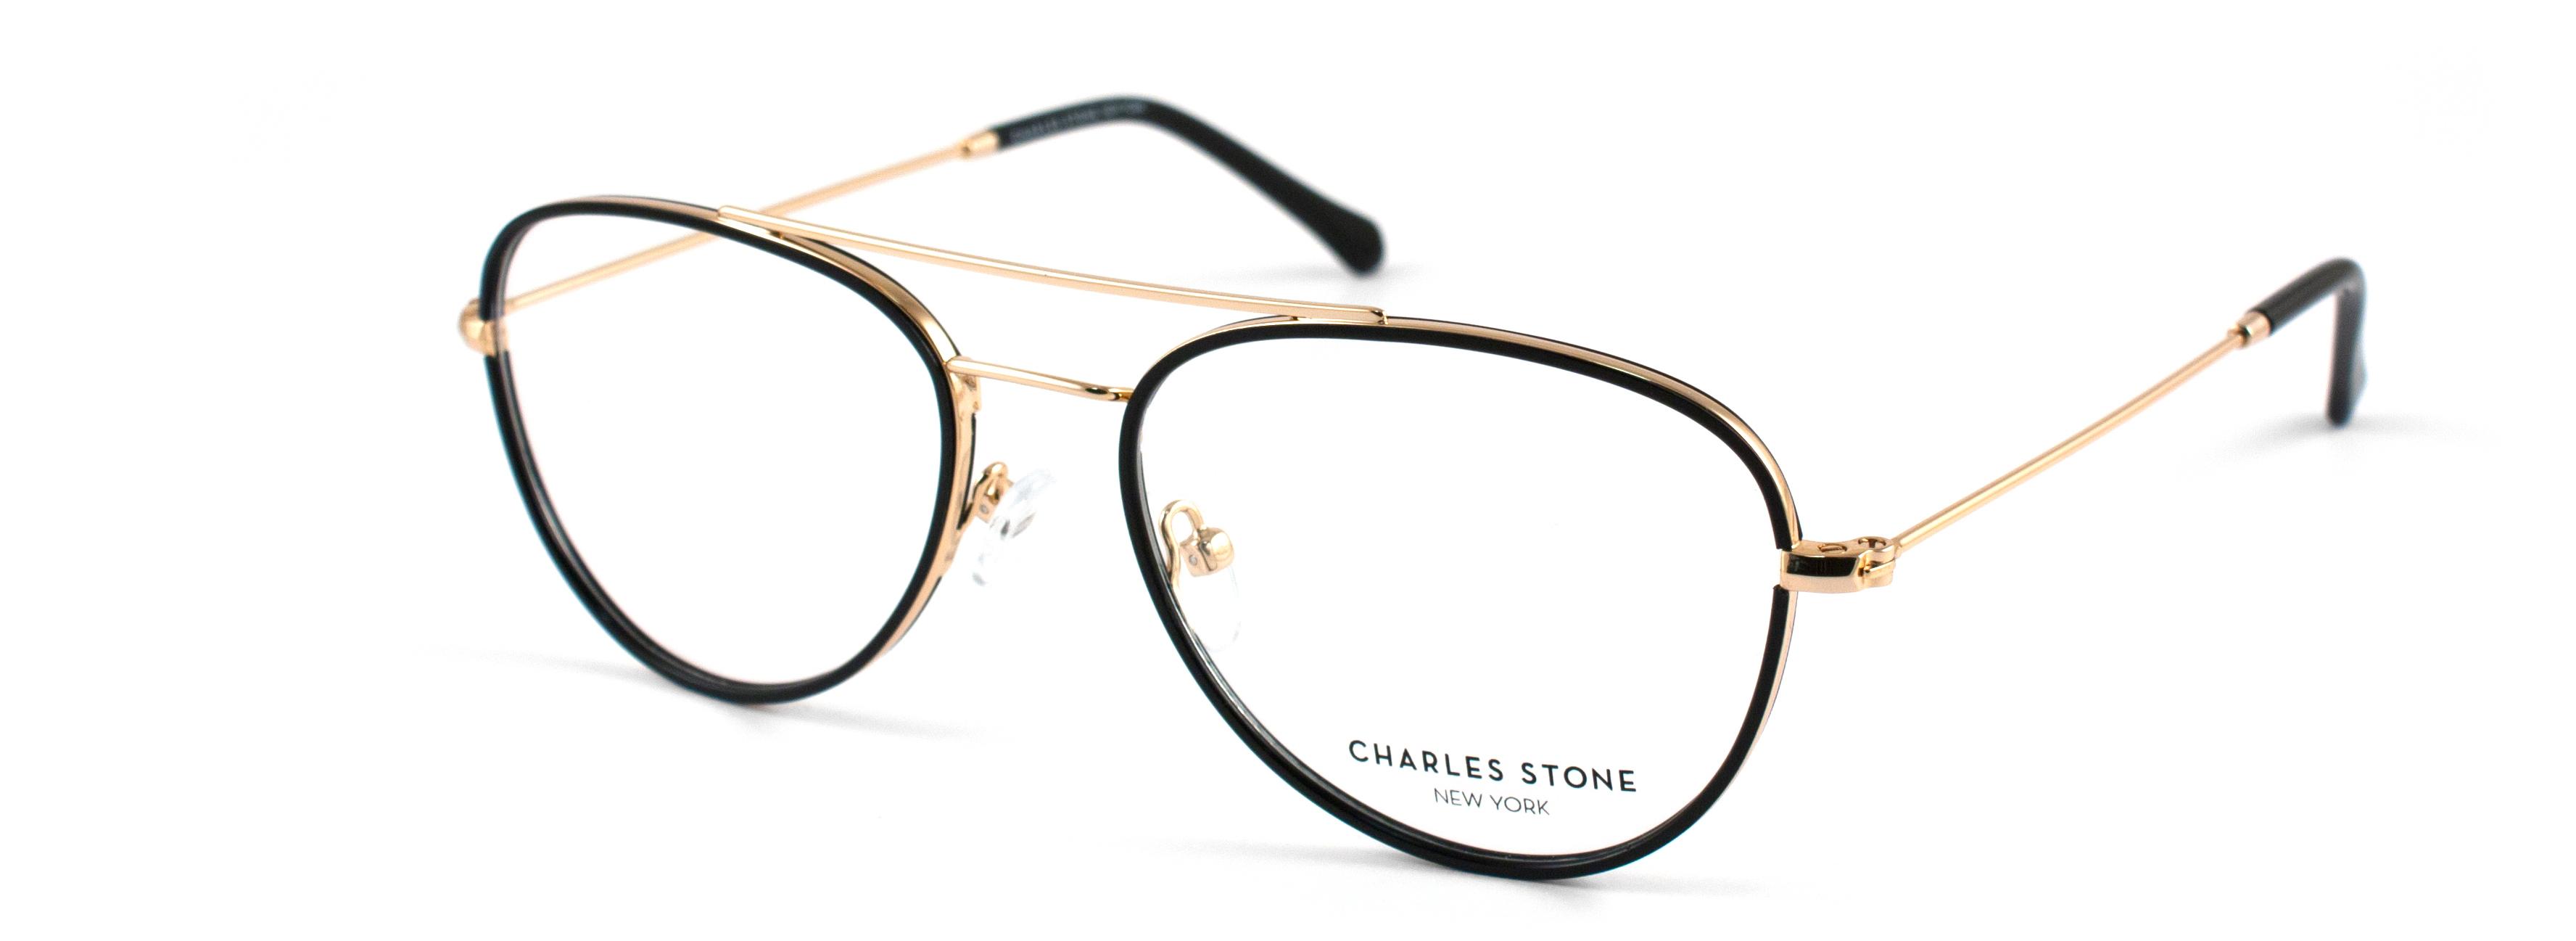 charles stone brillen in muenchen - Charles Stone